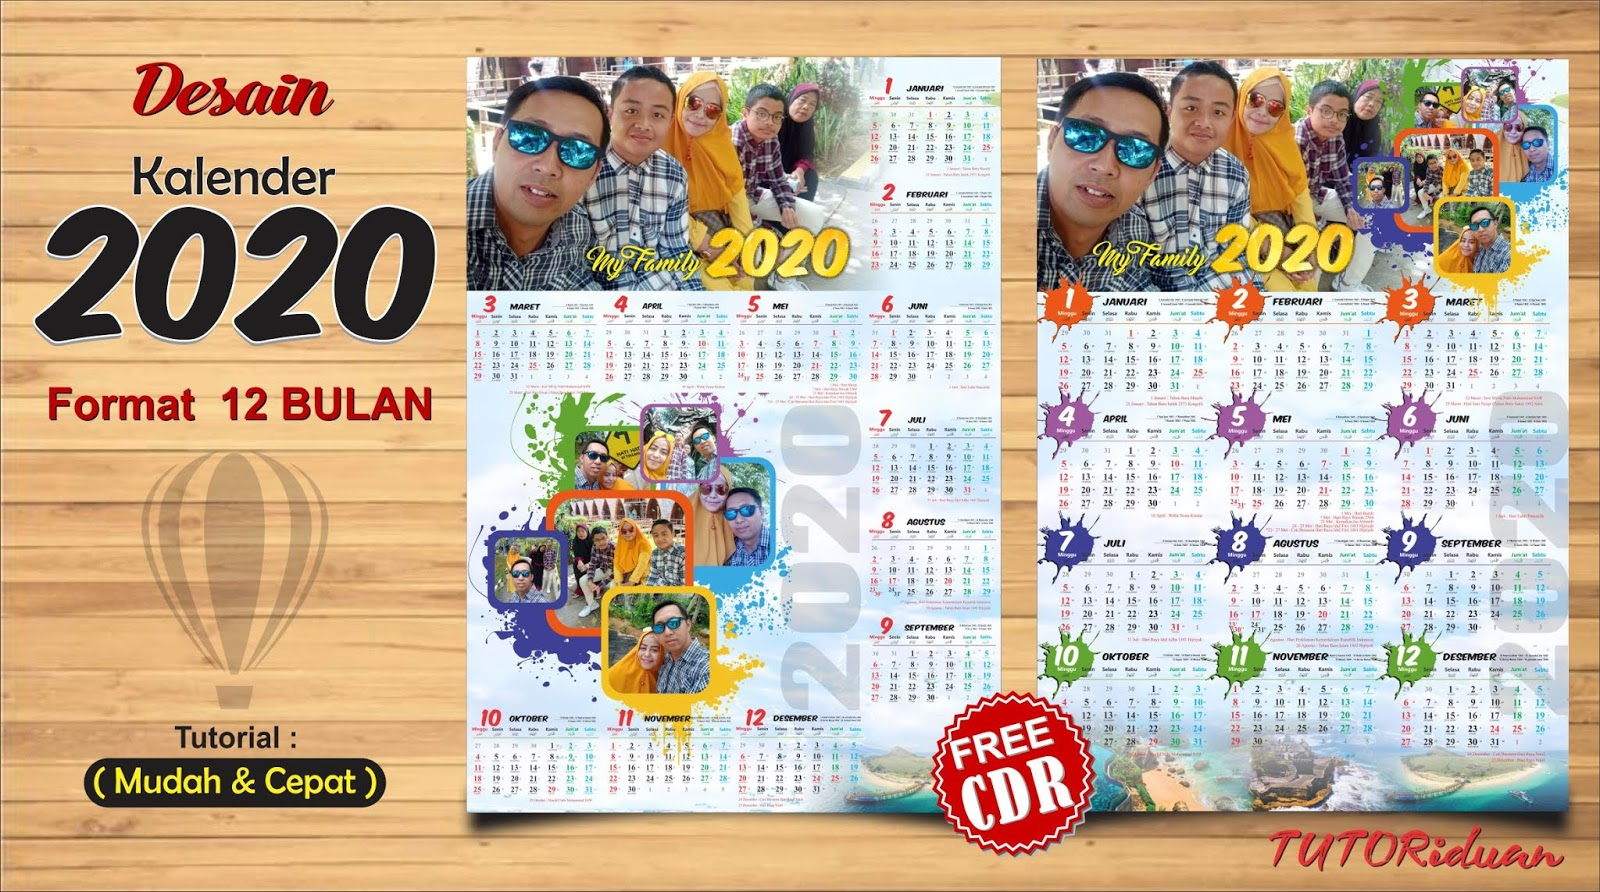 Desain Kalender Dinding 2020 Format 12 Bulan dengan ...